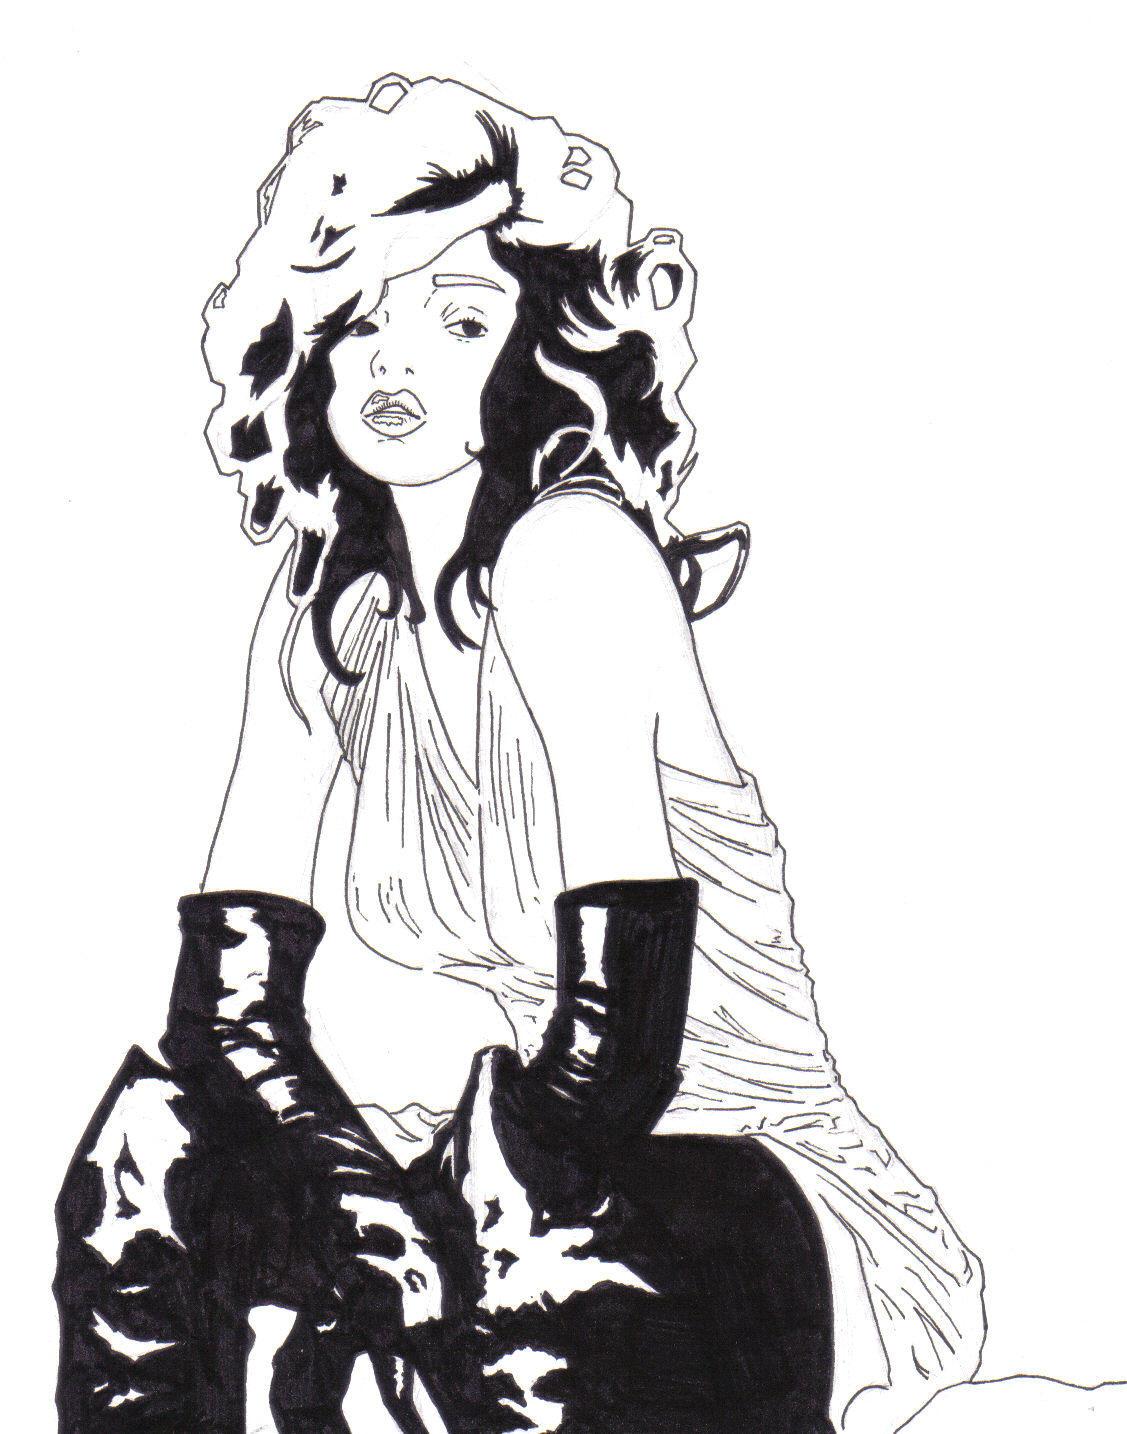 She by Pigglesworth